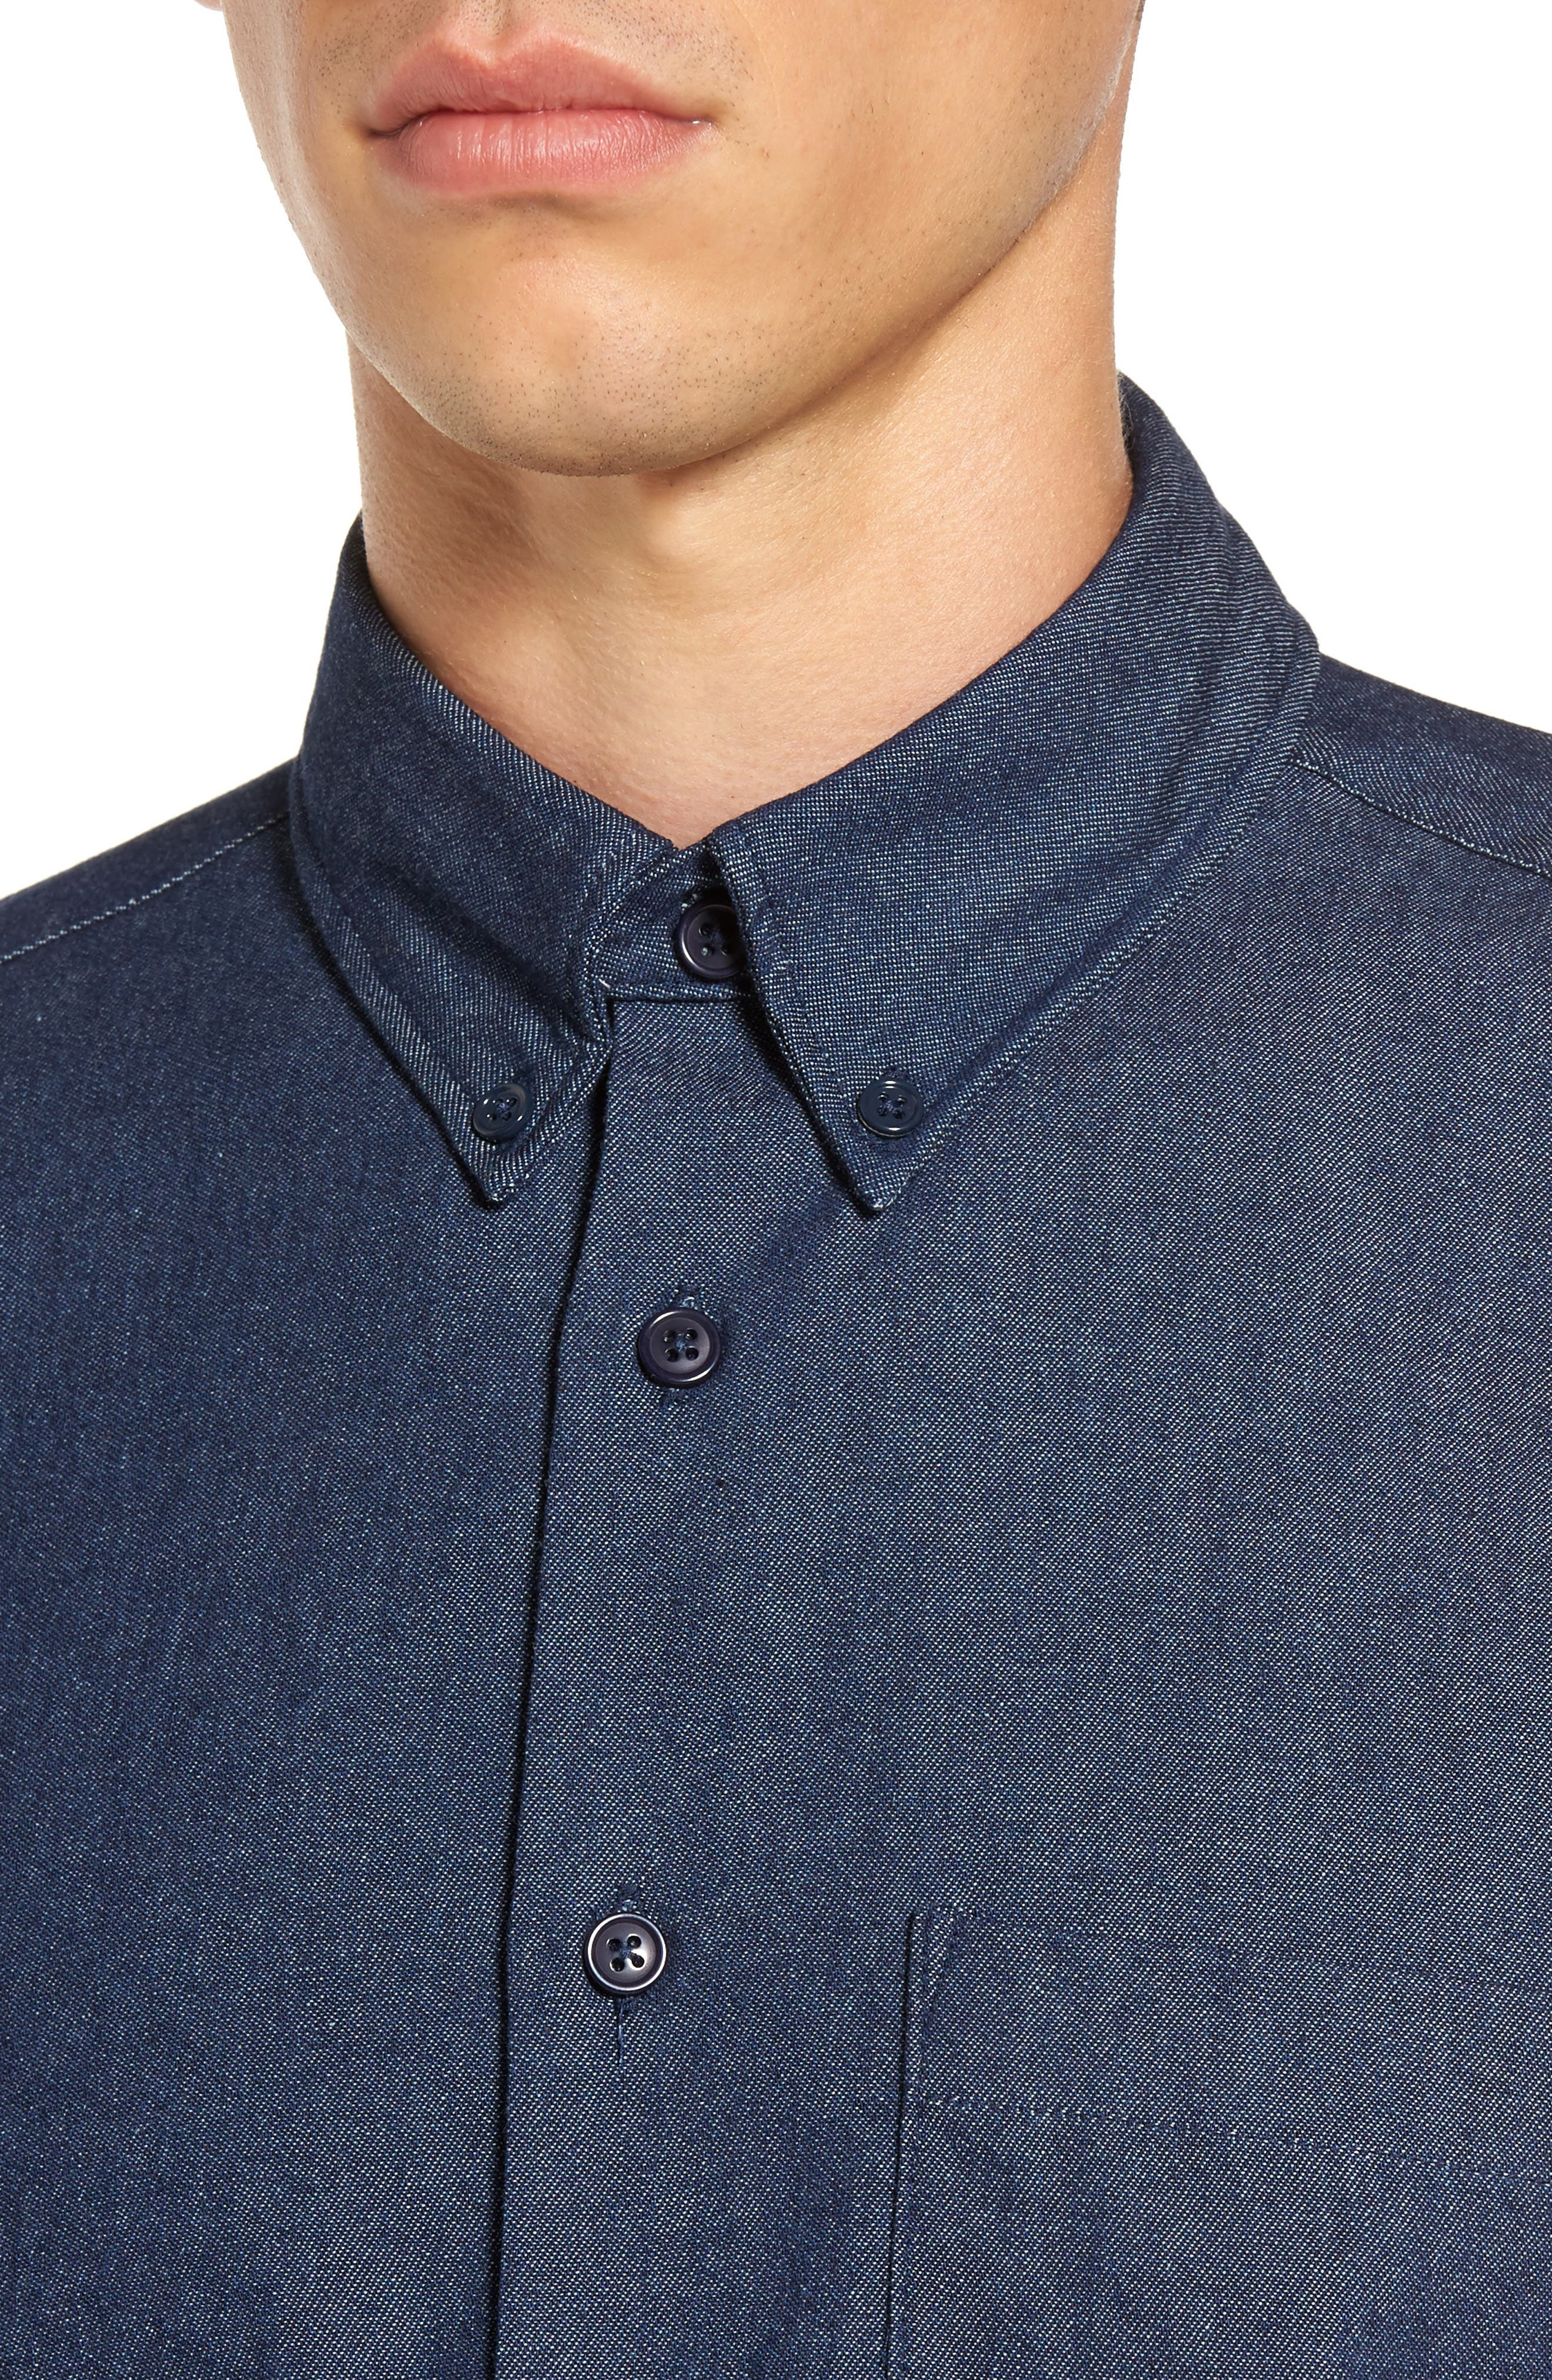 Indigo Long Sleeve Shirt,                             Alternate thumbnail 4, color,                             Indigo